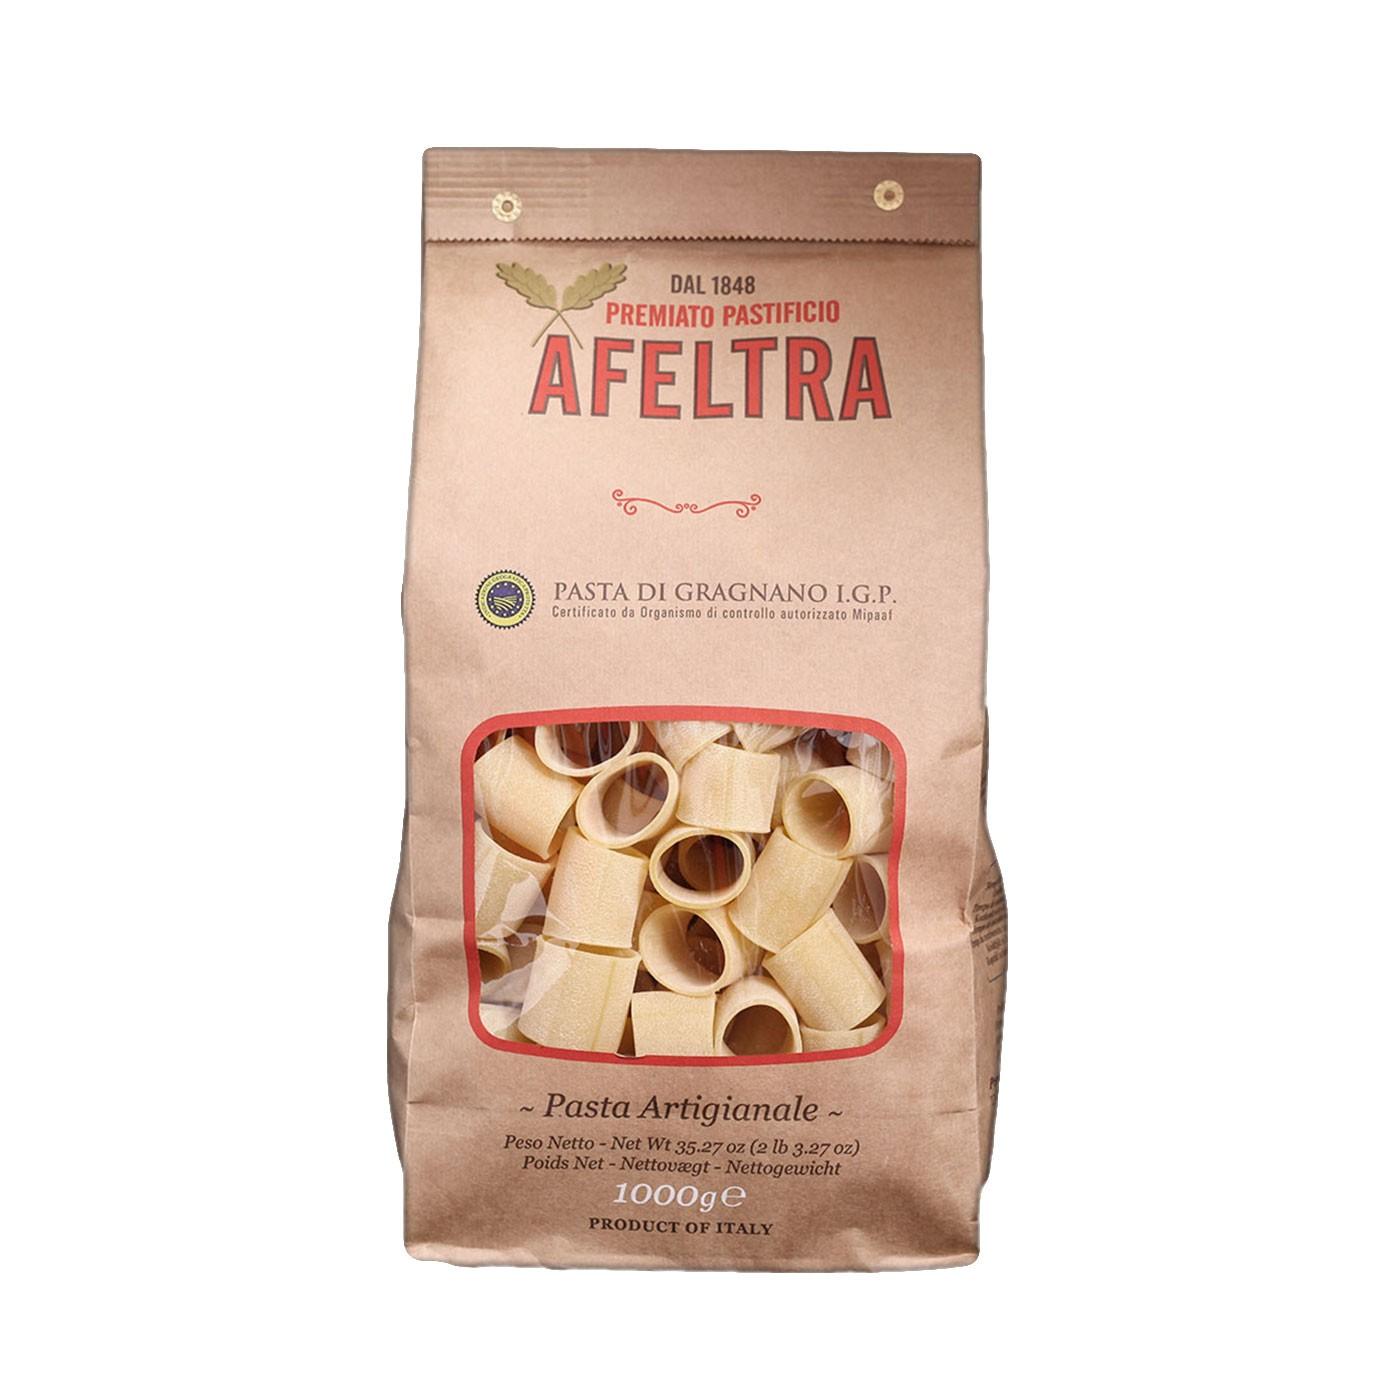 Mezzi Paccheri 35.5 oz - Afeltra